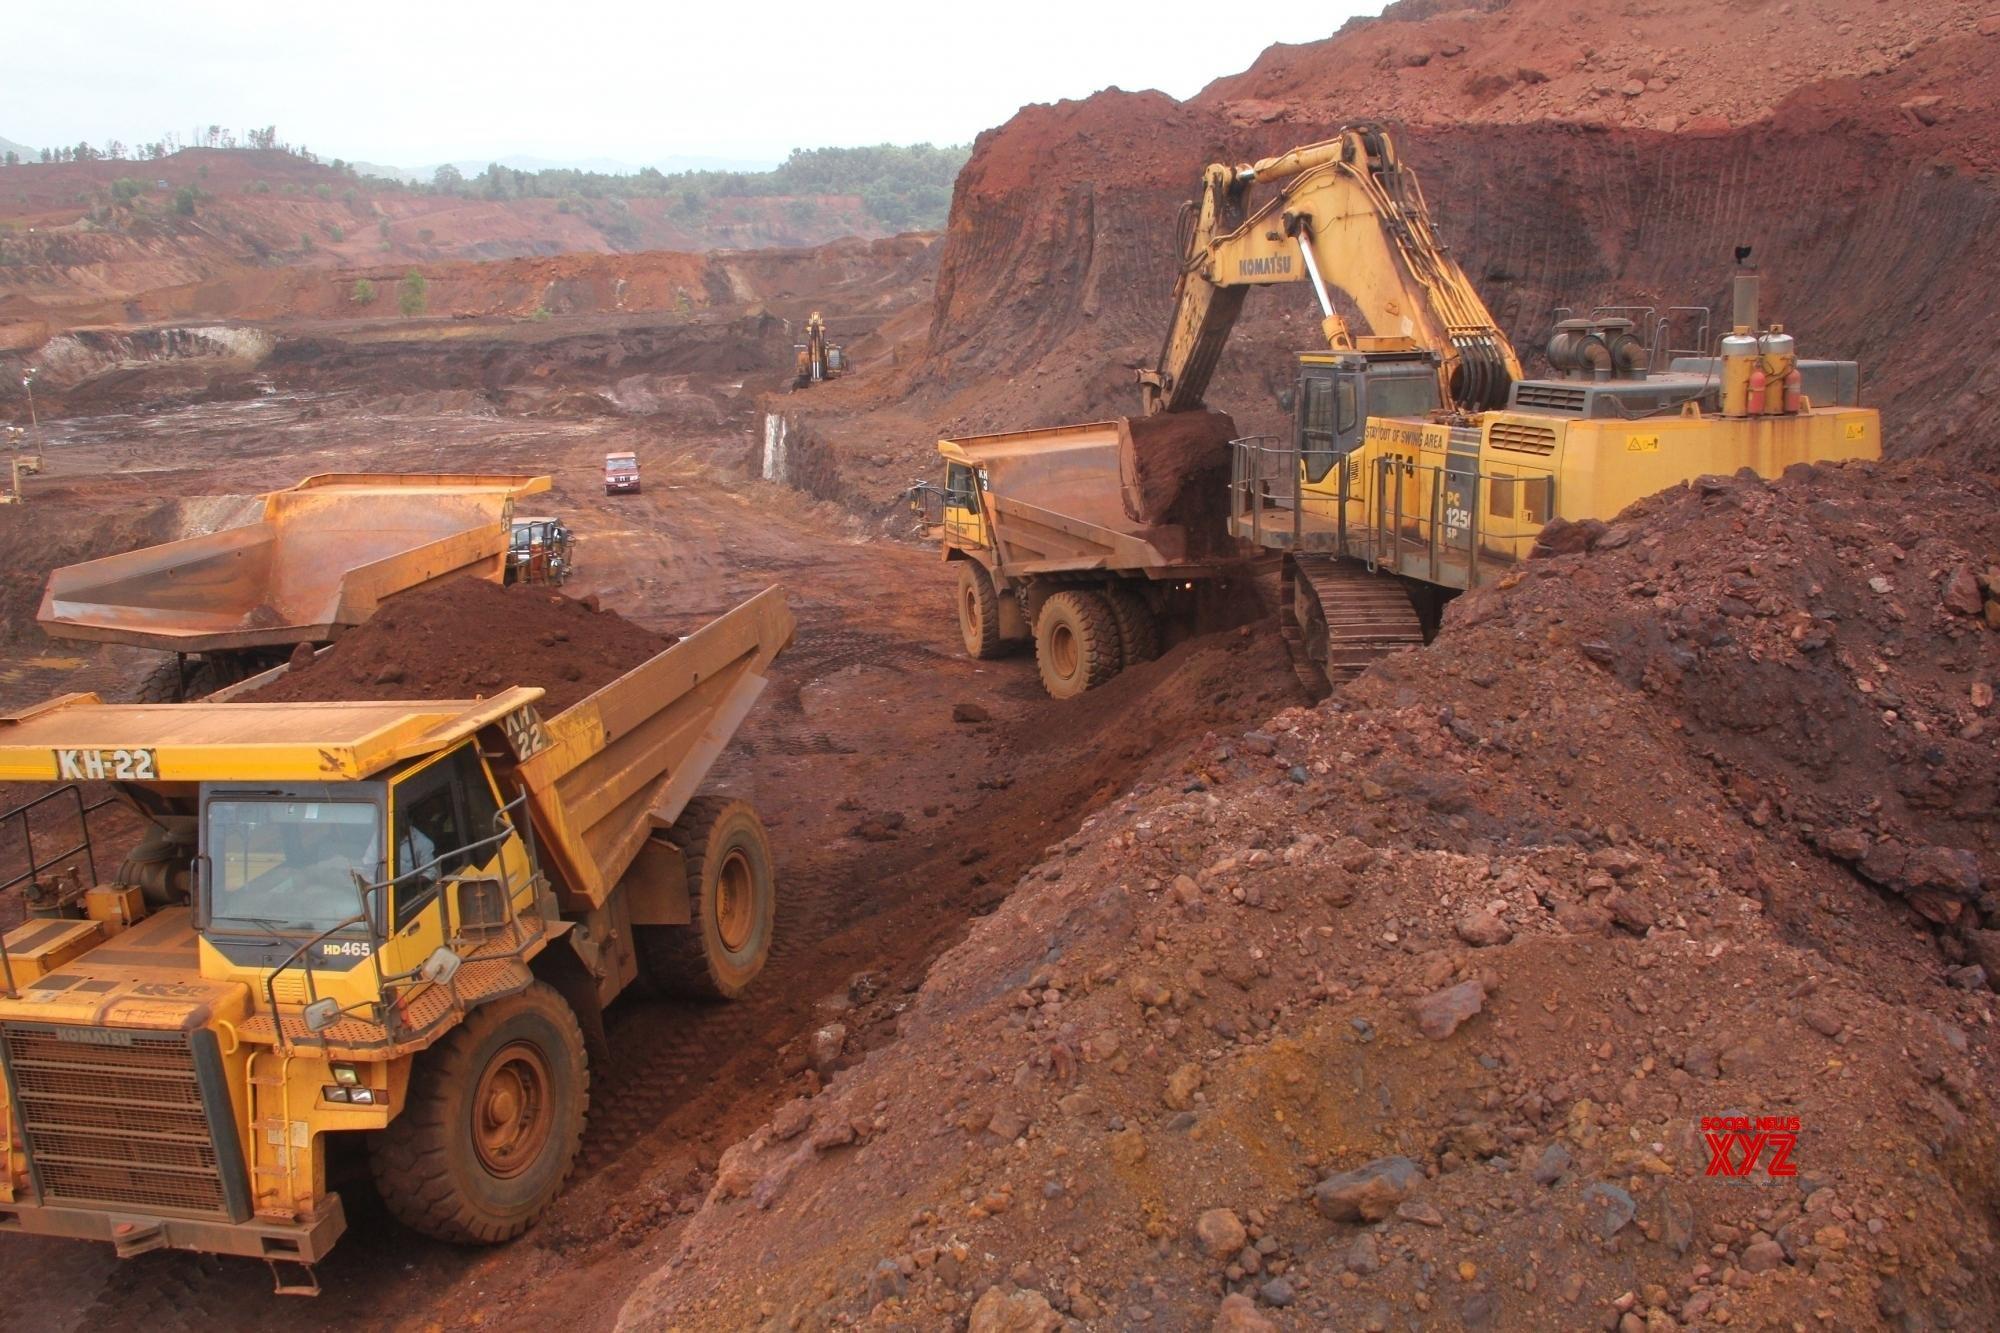 Goa body seeks Shah's help to resume mining activity